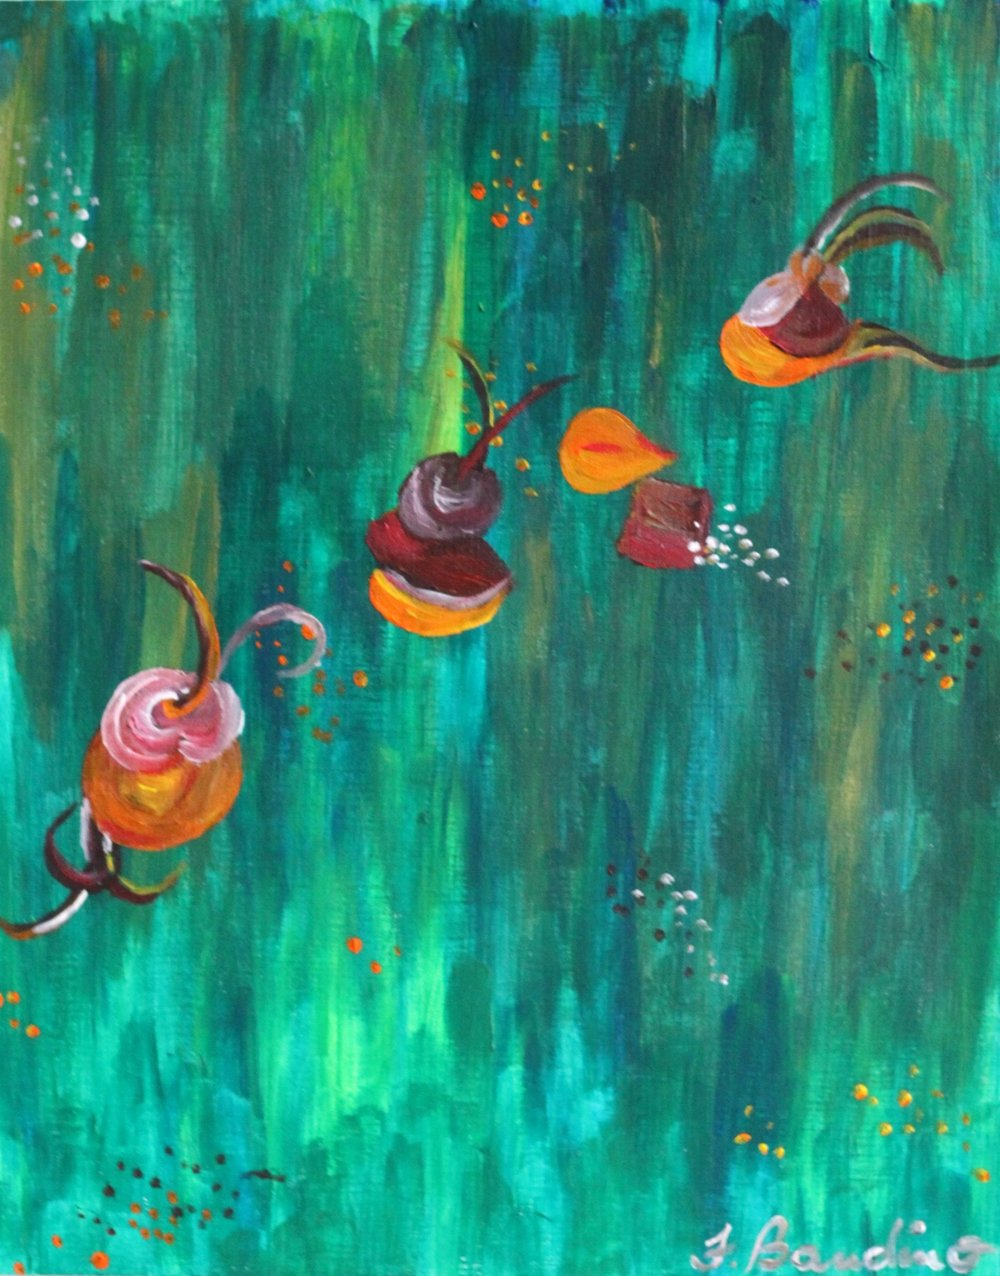 ©April 2014, Francesca Bandino,  Beet Salad . Acrylic on Canvas, 16.1x13 inches